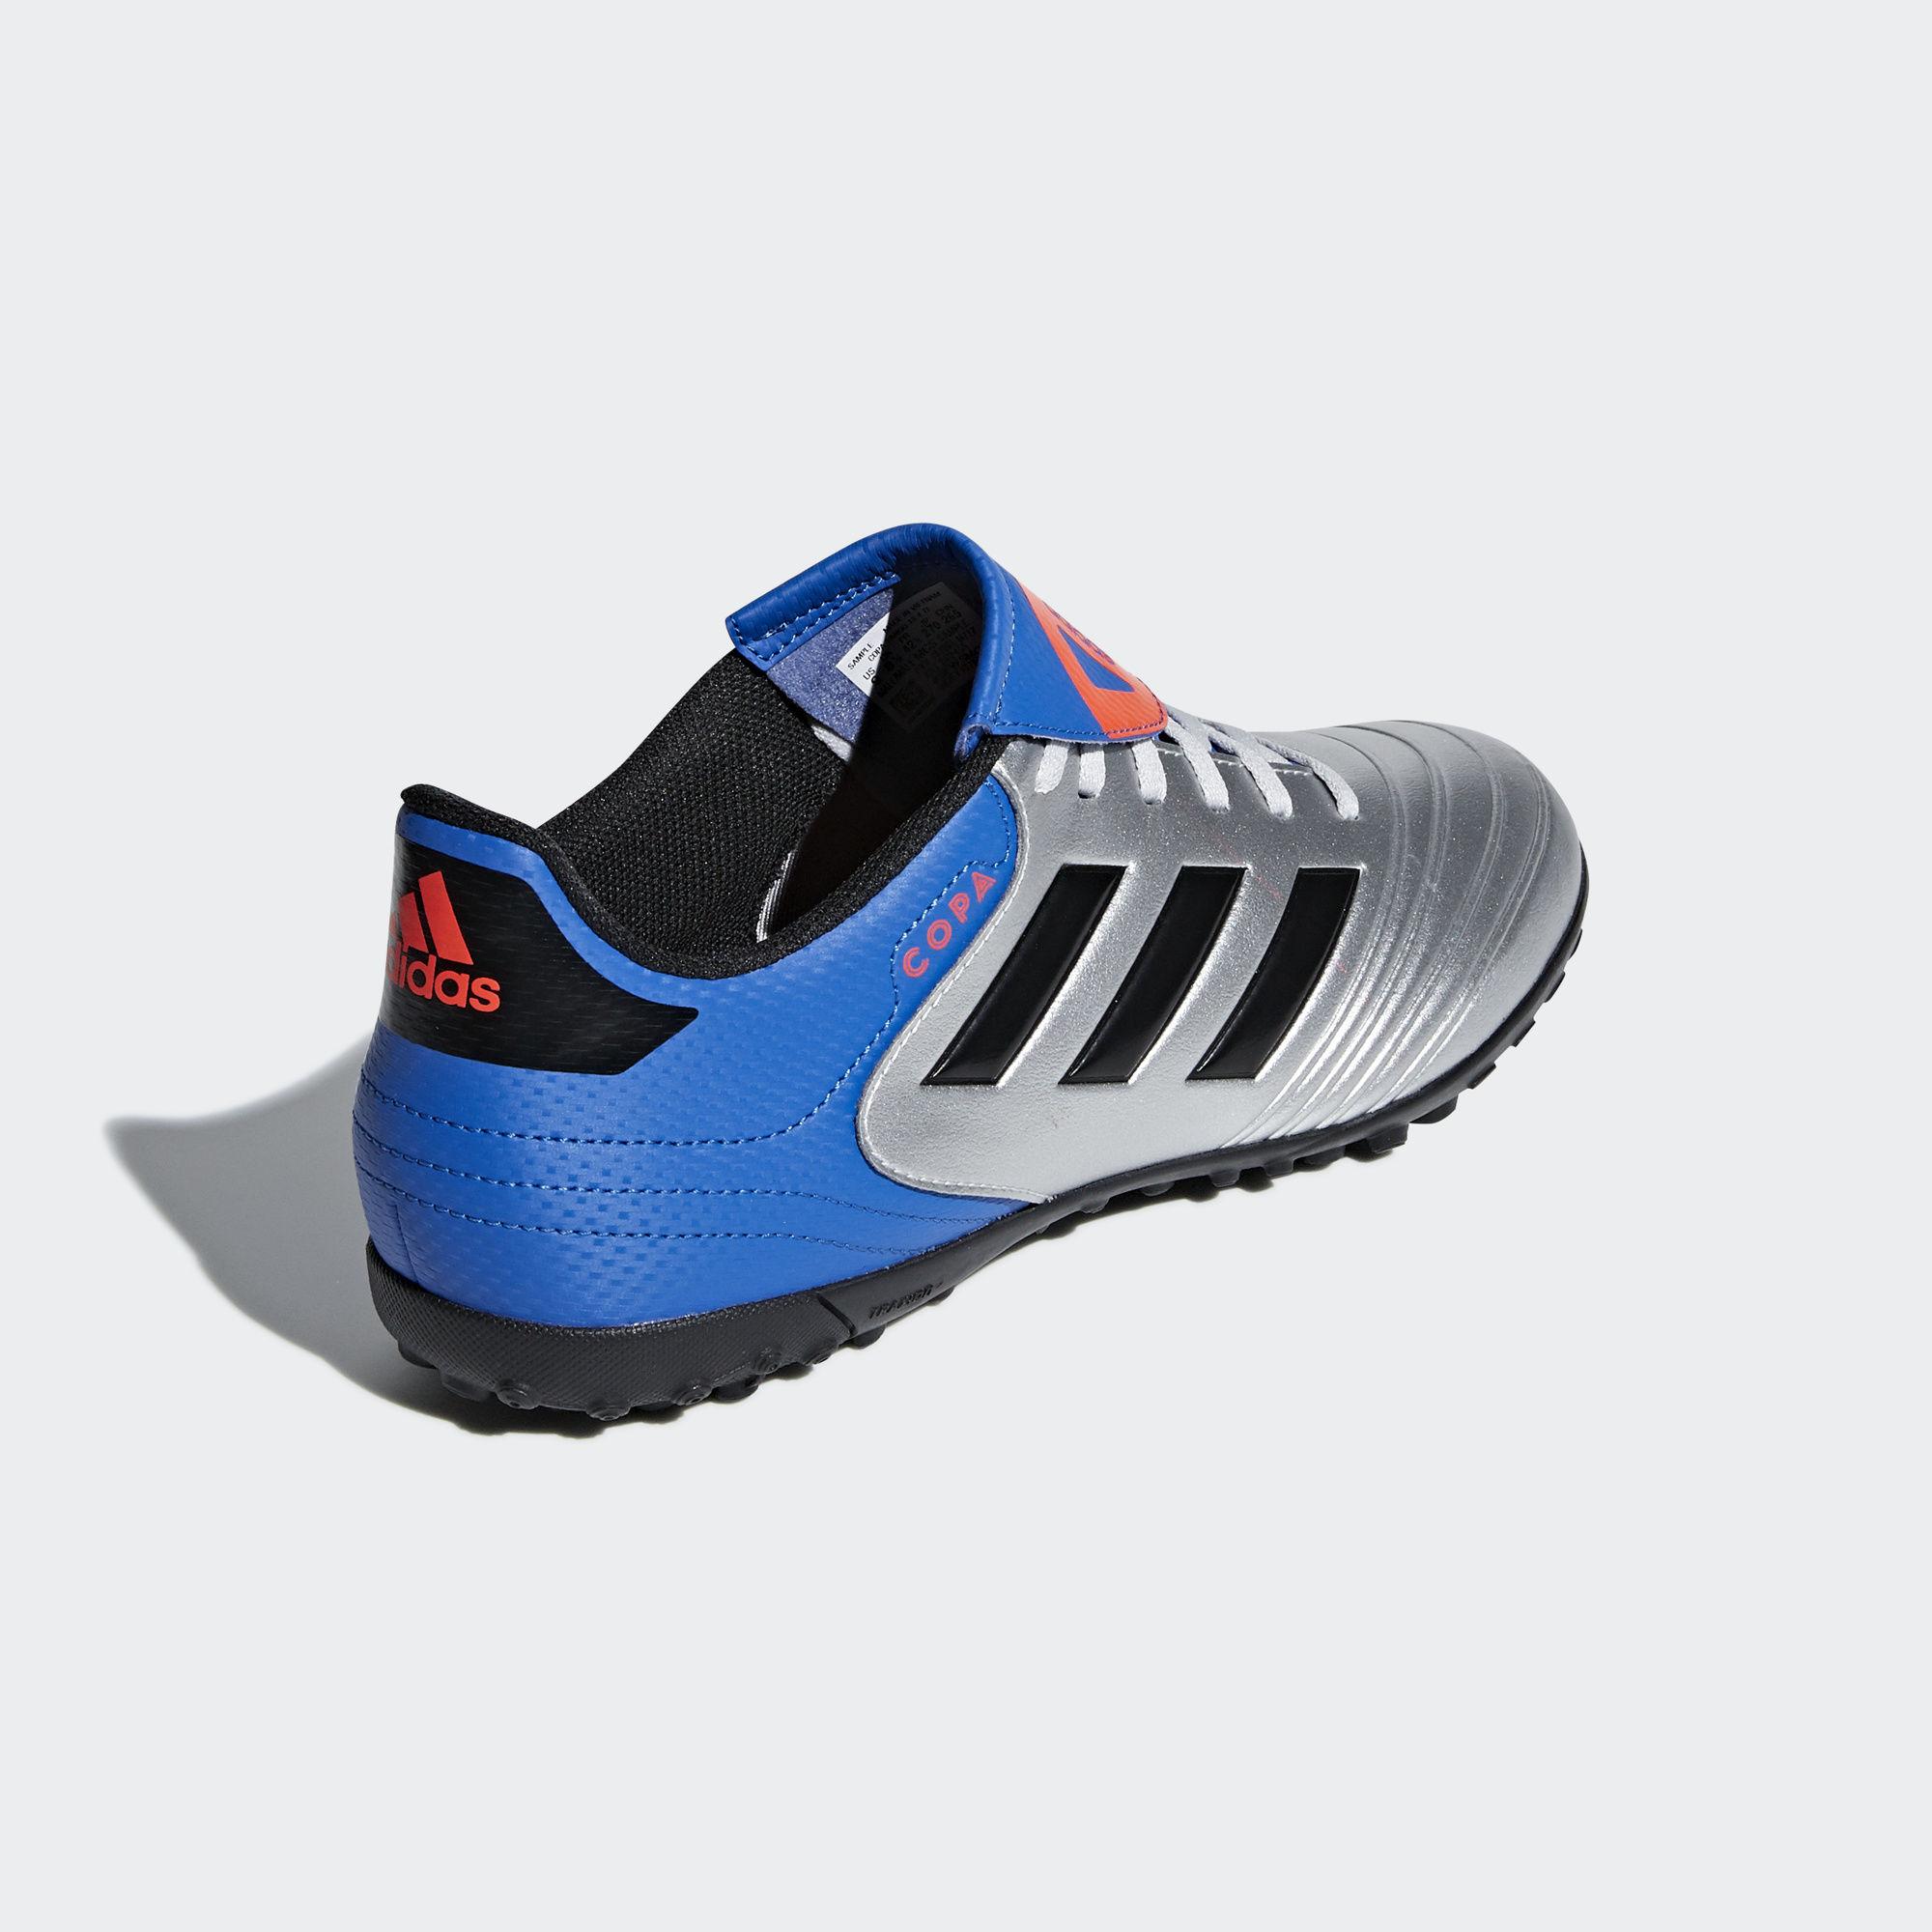 Football-shoes-Adidas-Scarpe-Calcio-Copa-Tango-18-4-Silver-Calcetto-Turf-2018 miniatura 4